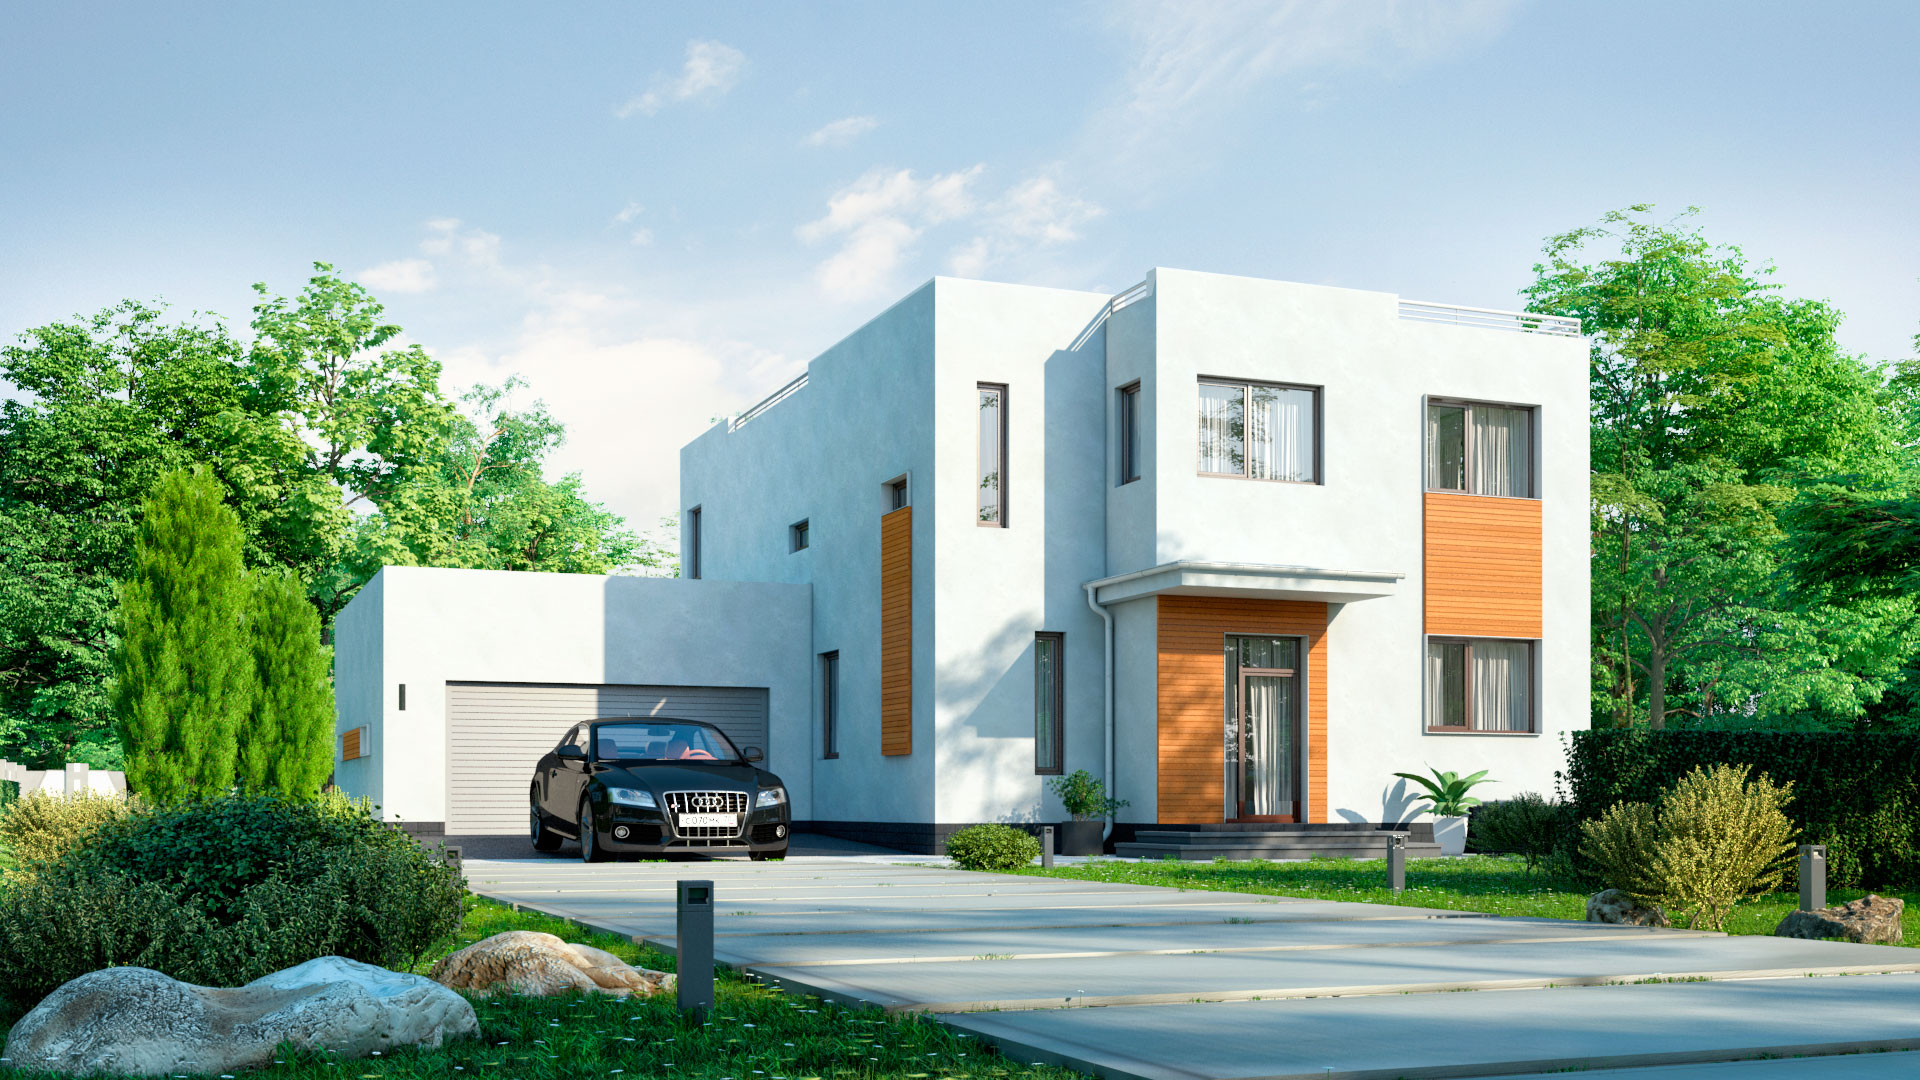 Передний фасад двухэтажного дома 15 на 15, проект БЭНПАН БП-289.